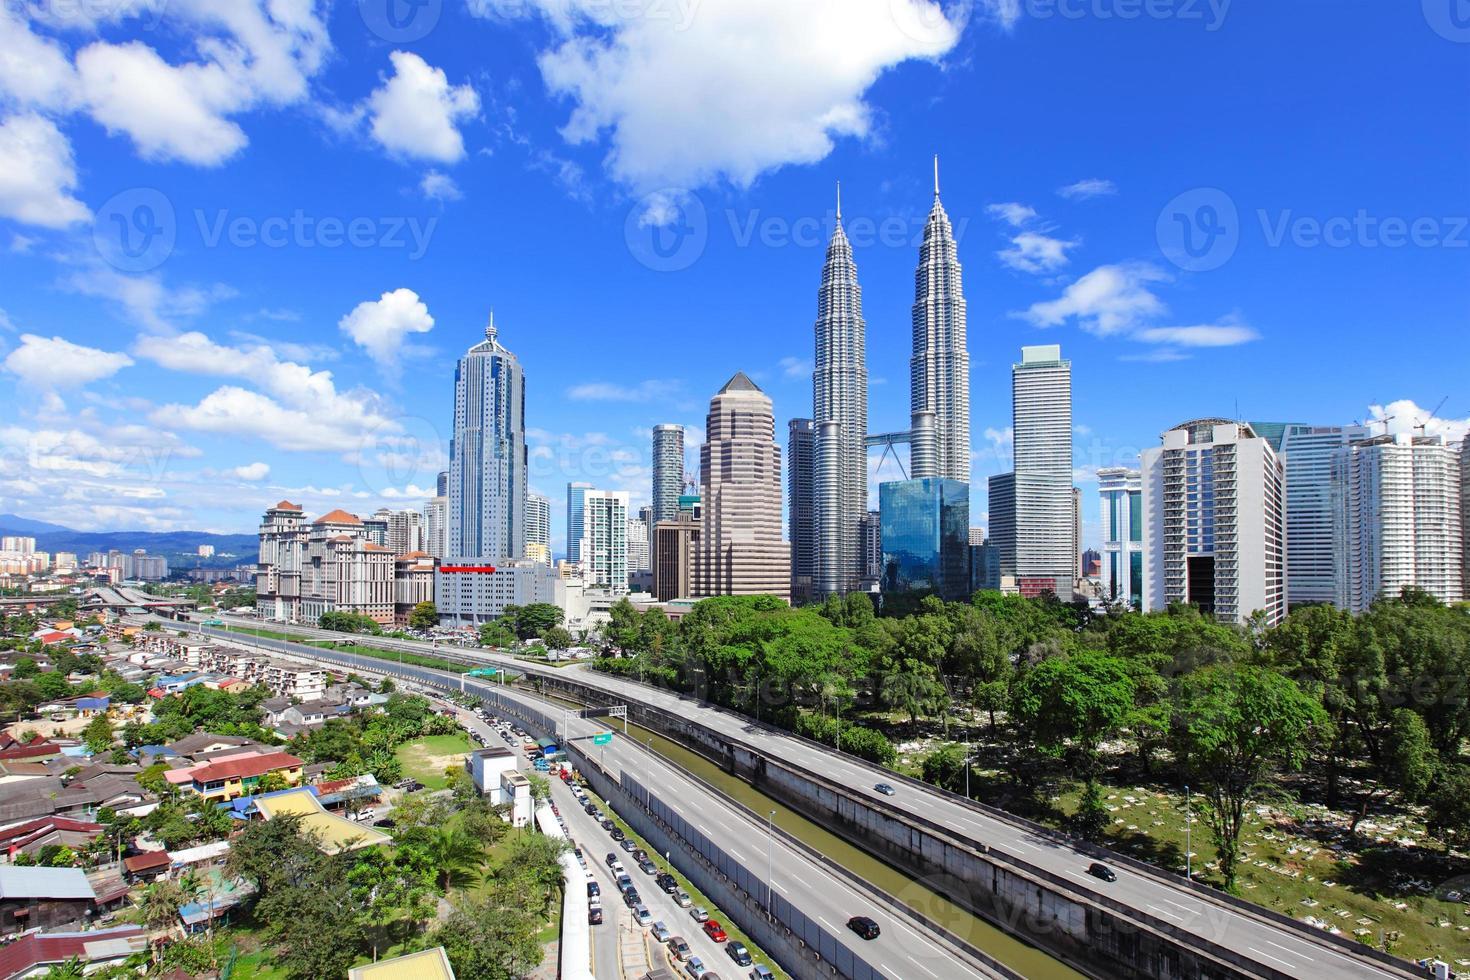 Kuala Lumpur skyline photo